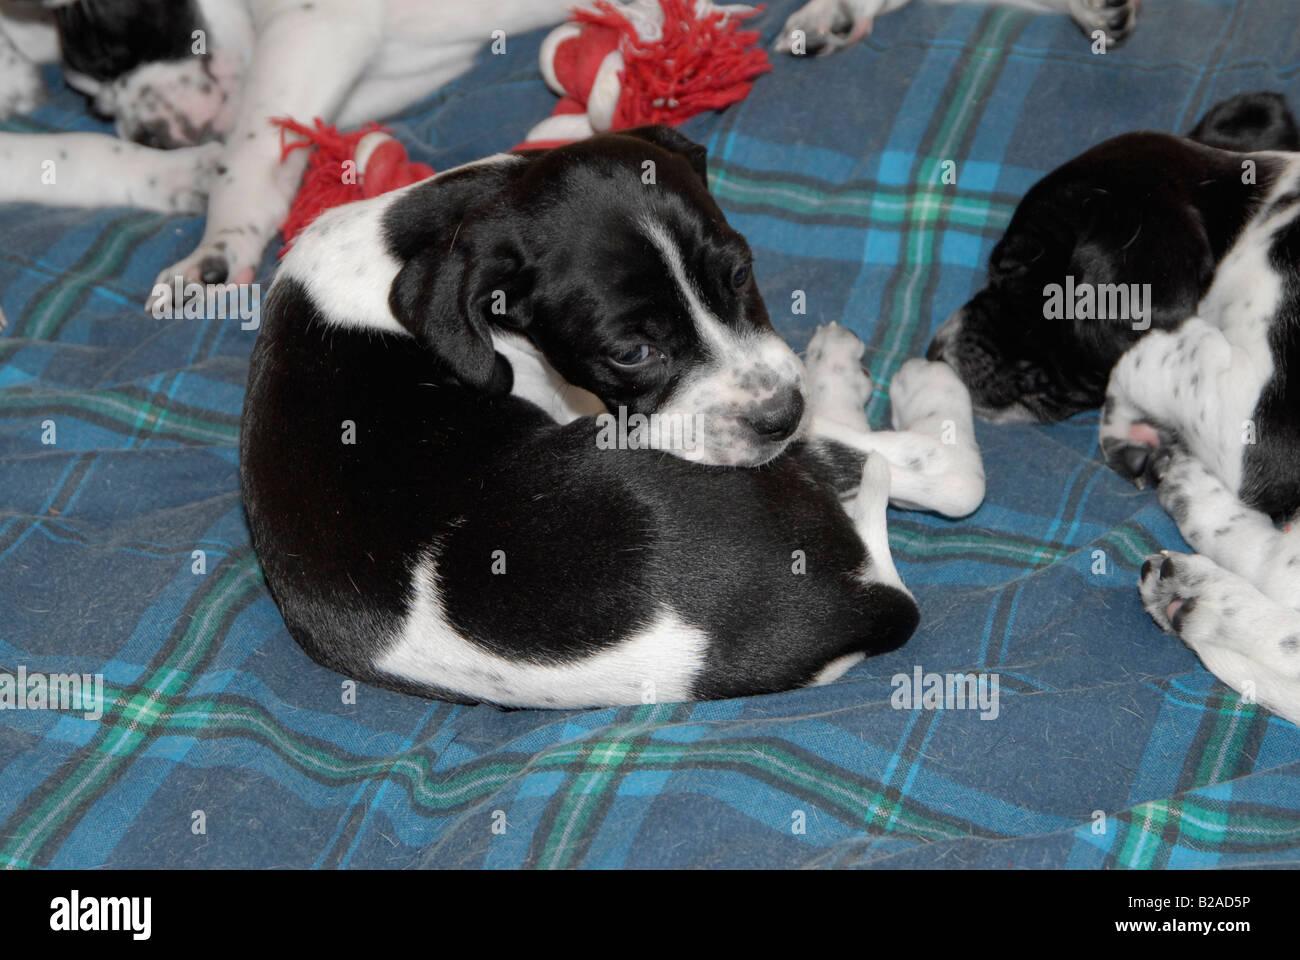 English Pointer Puppy Stock Photos & English Pointer Puppy Stock ...